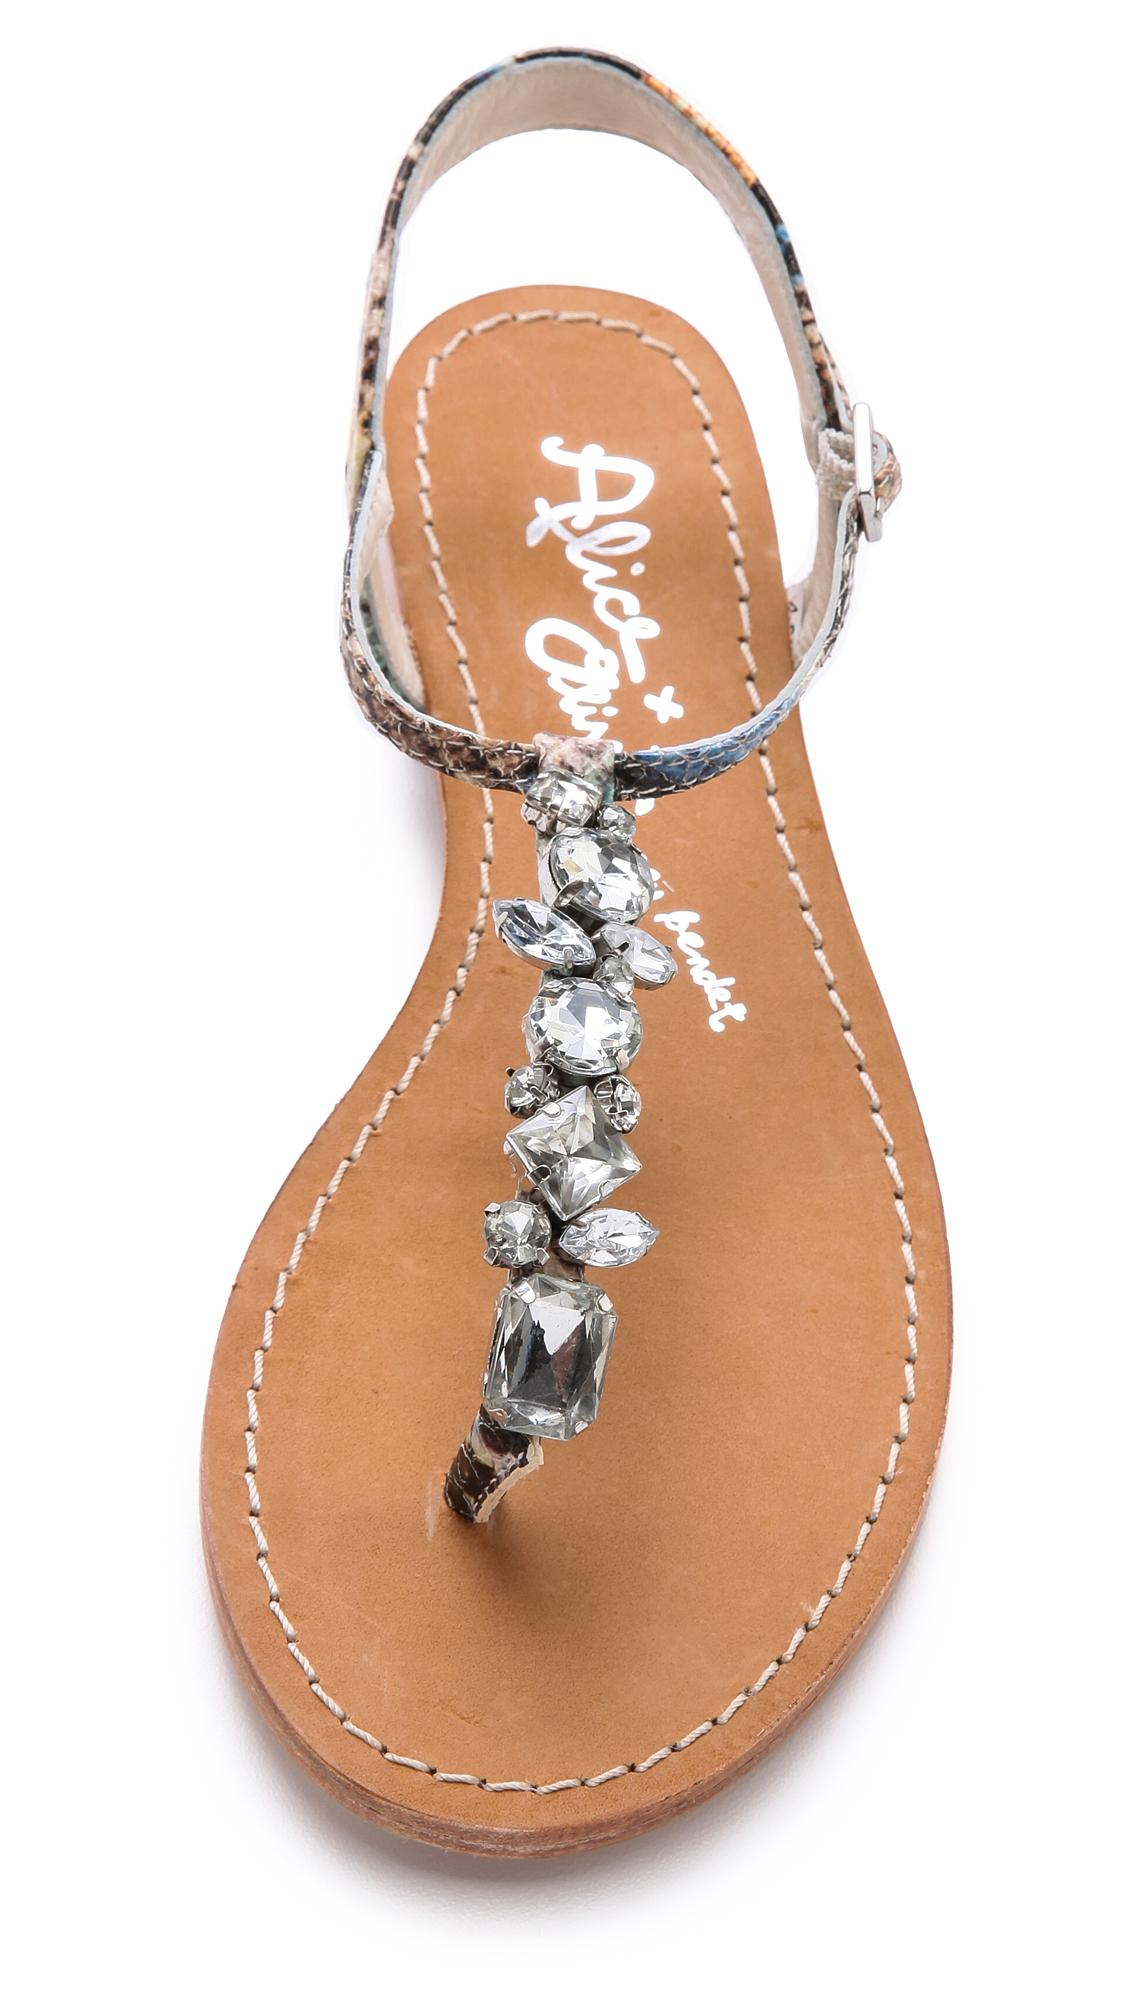 00d80bafe Lyst - Alice + Olivia Alice Olivia Nia Jeweled Flat Sandals in Black